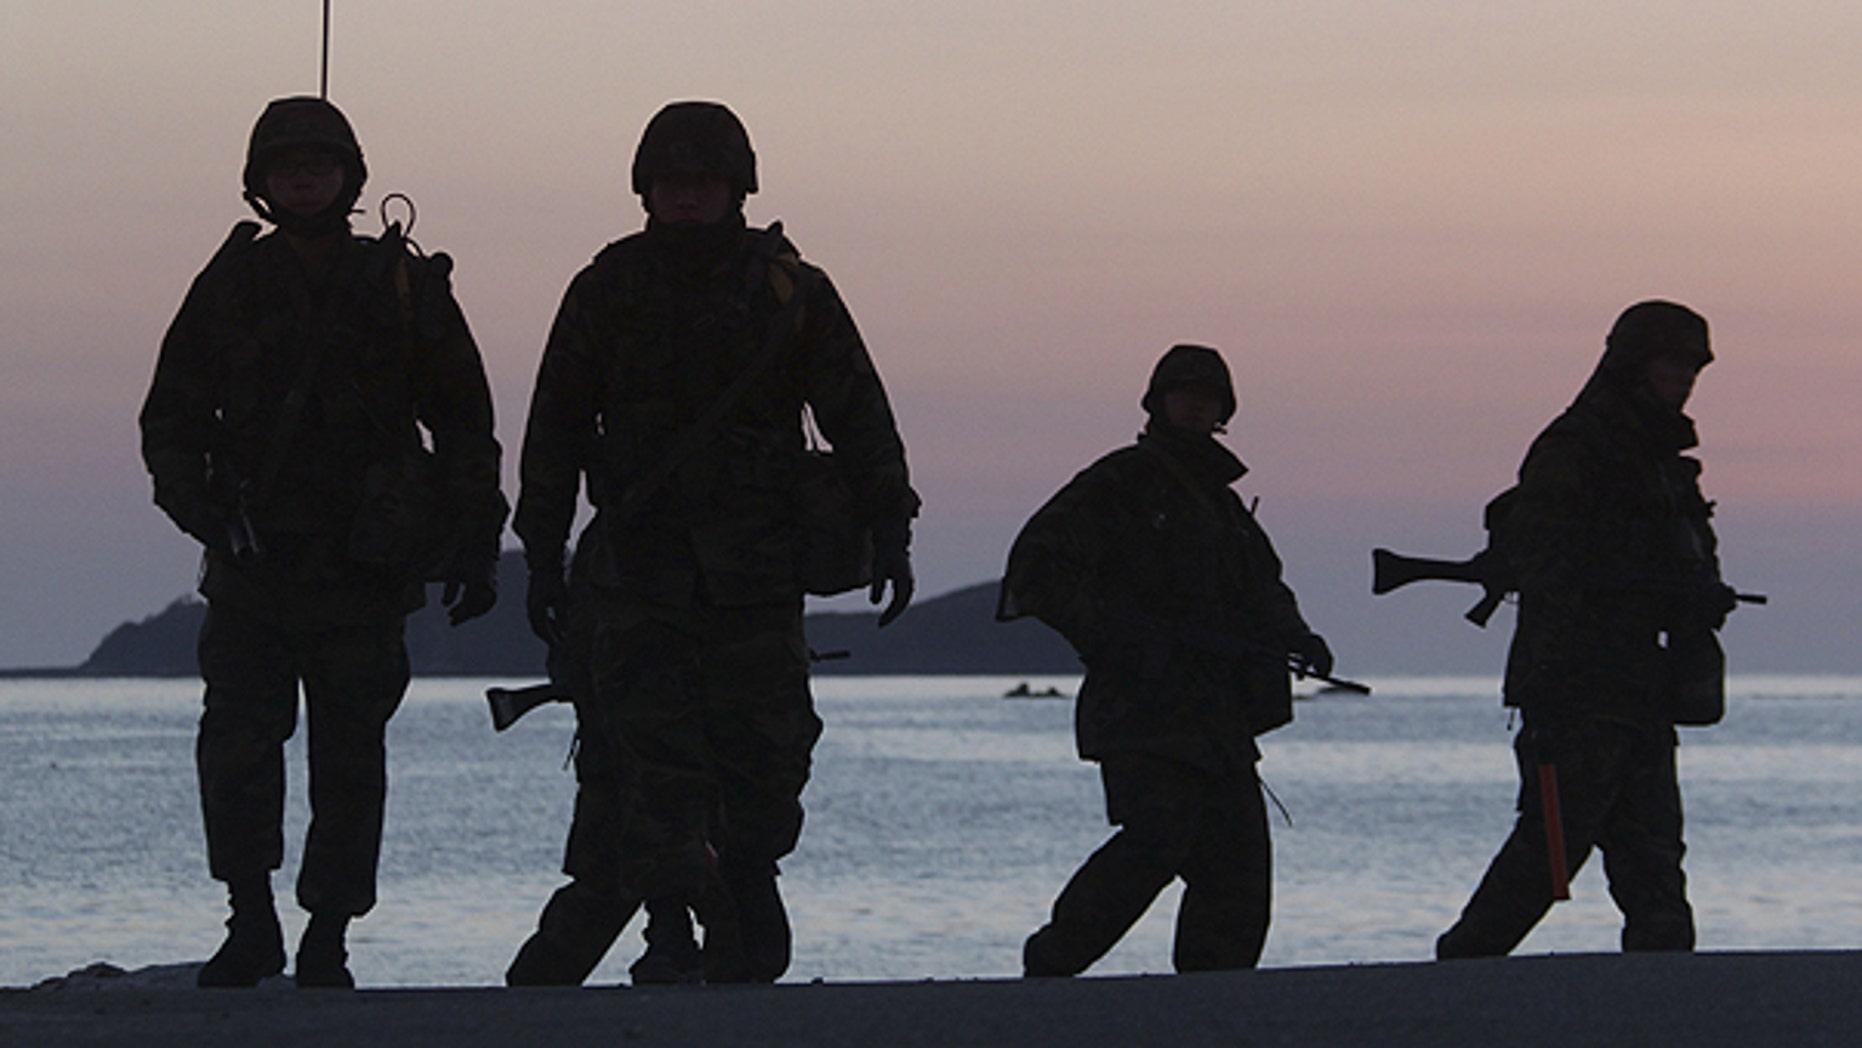 Dec. 10: South Korean marines patrol along the beach of Yeonpyeong Island, South Korea.